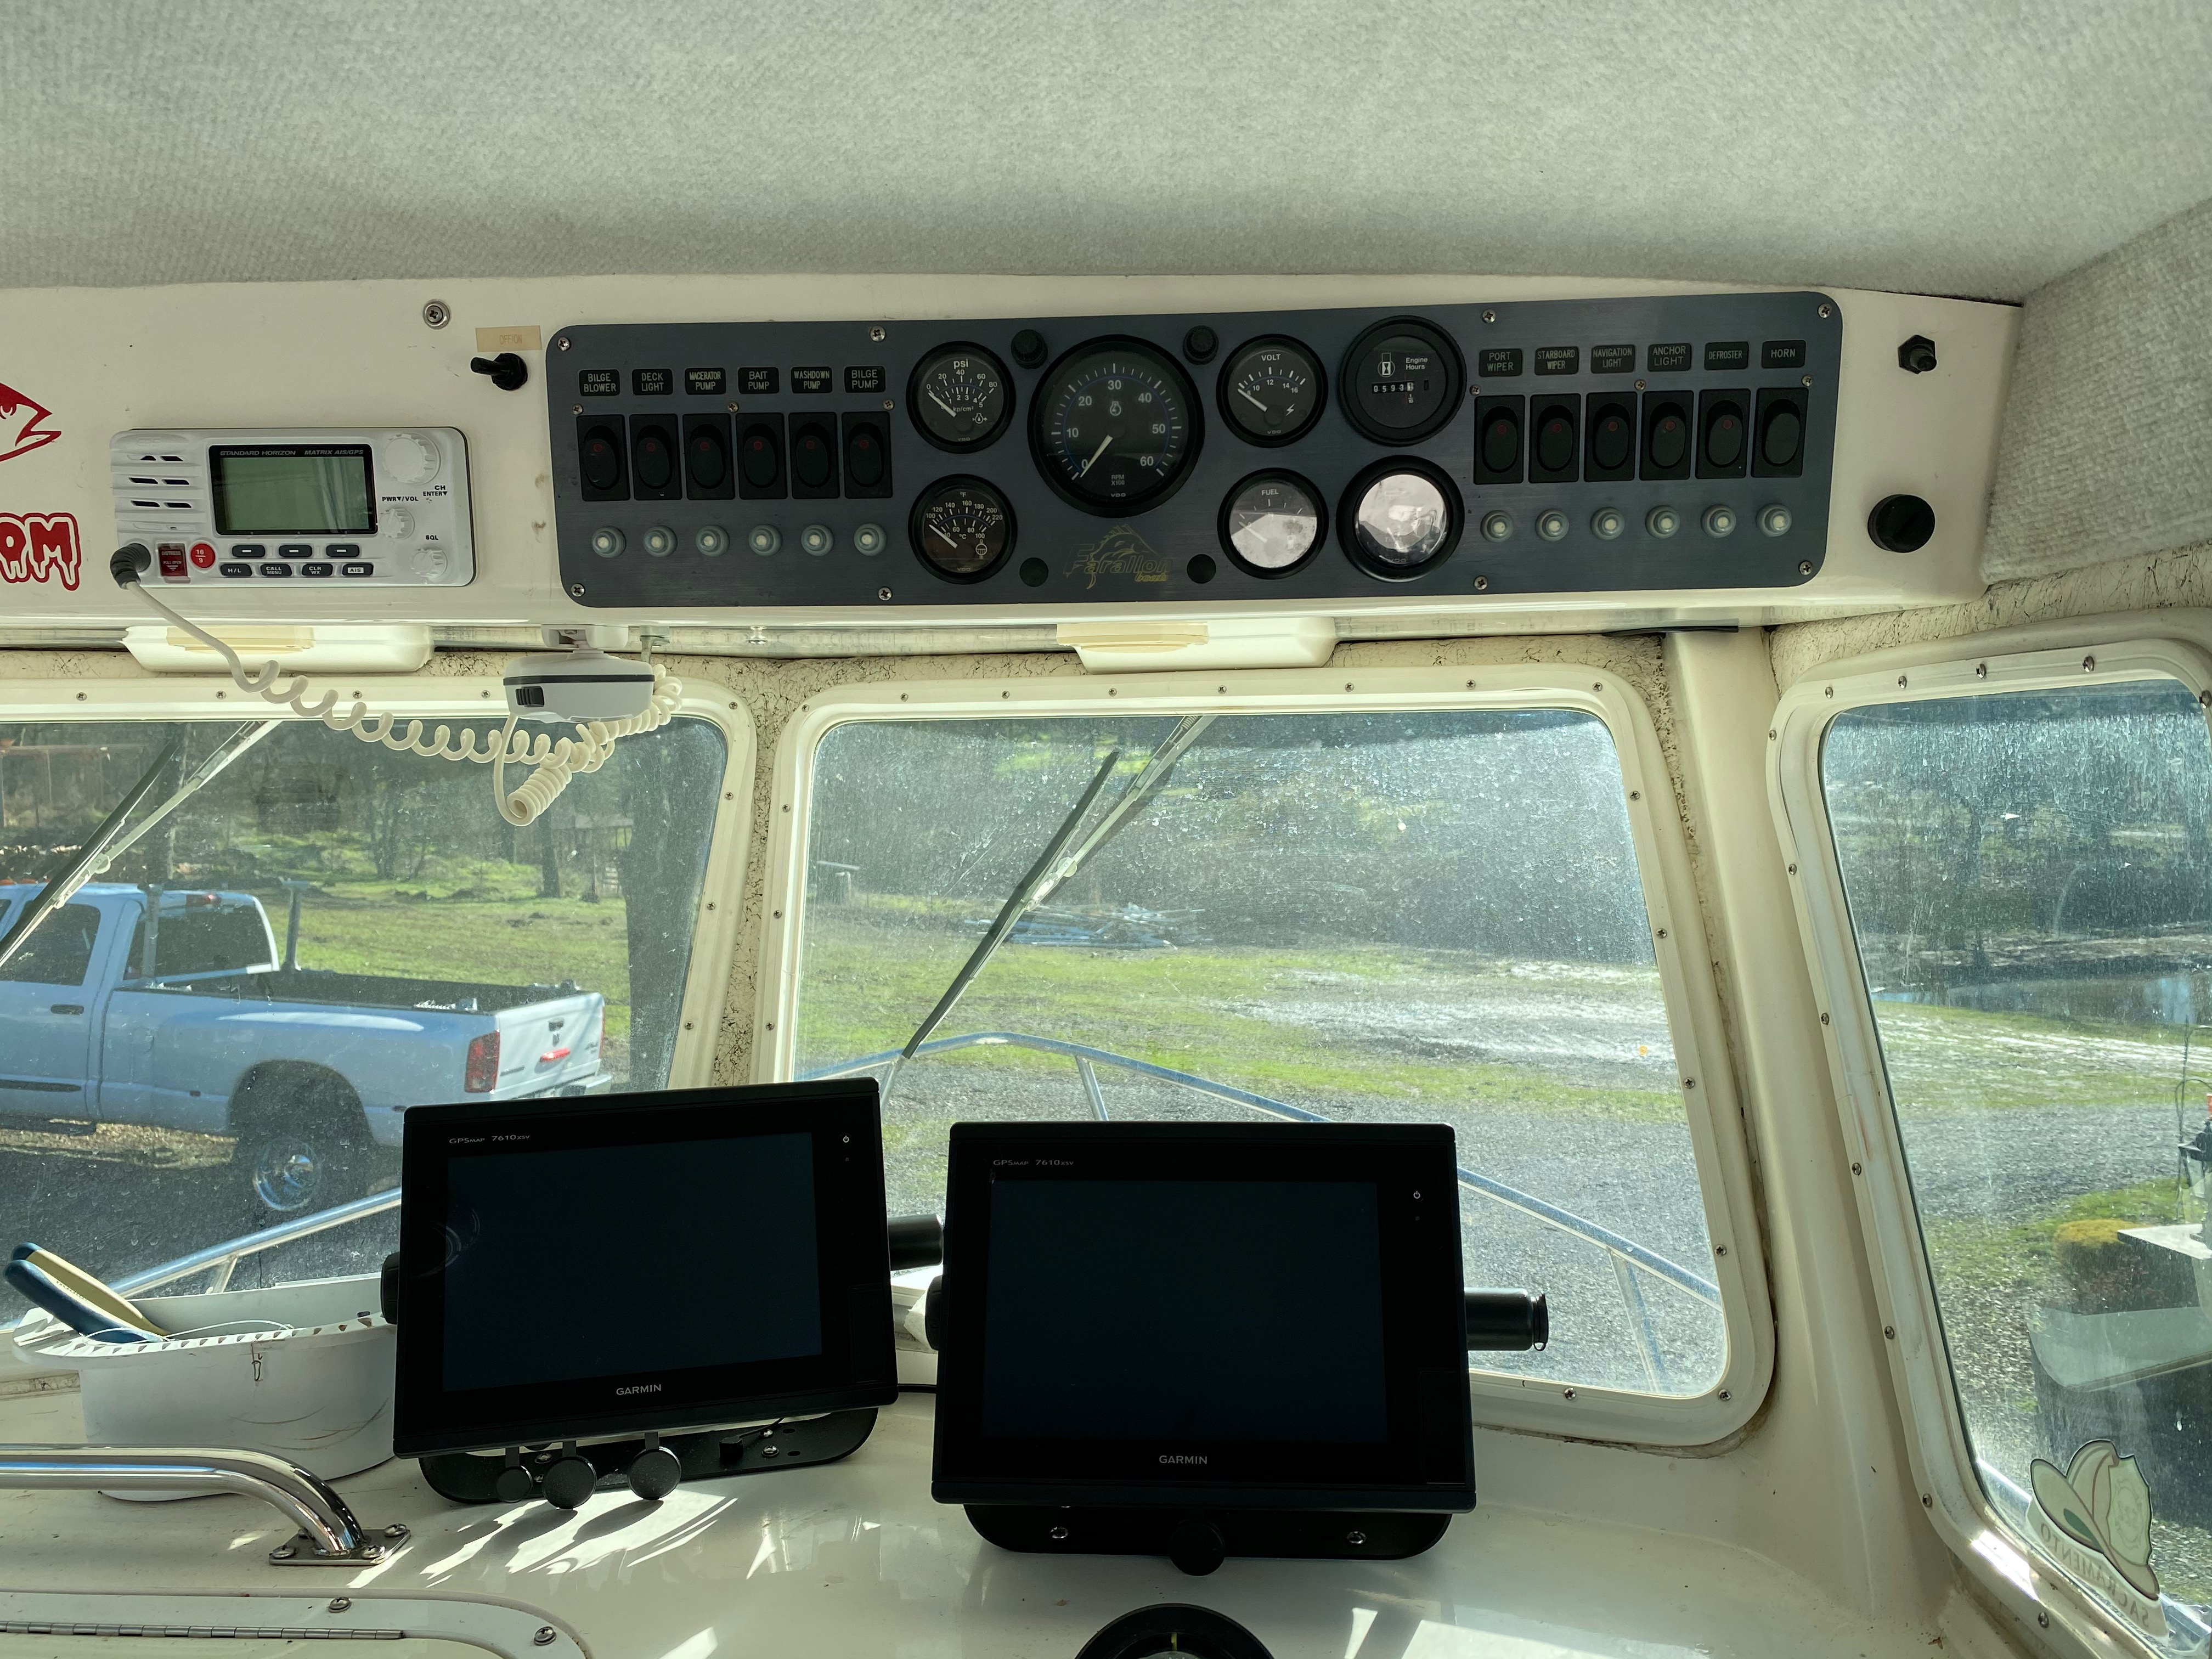 A863F2FE-25F5-4A9C-AEC8-A391513CAB8C.jpeg